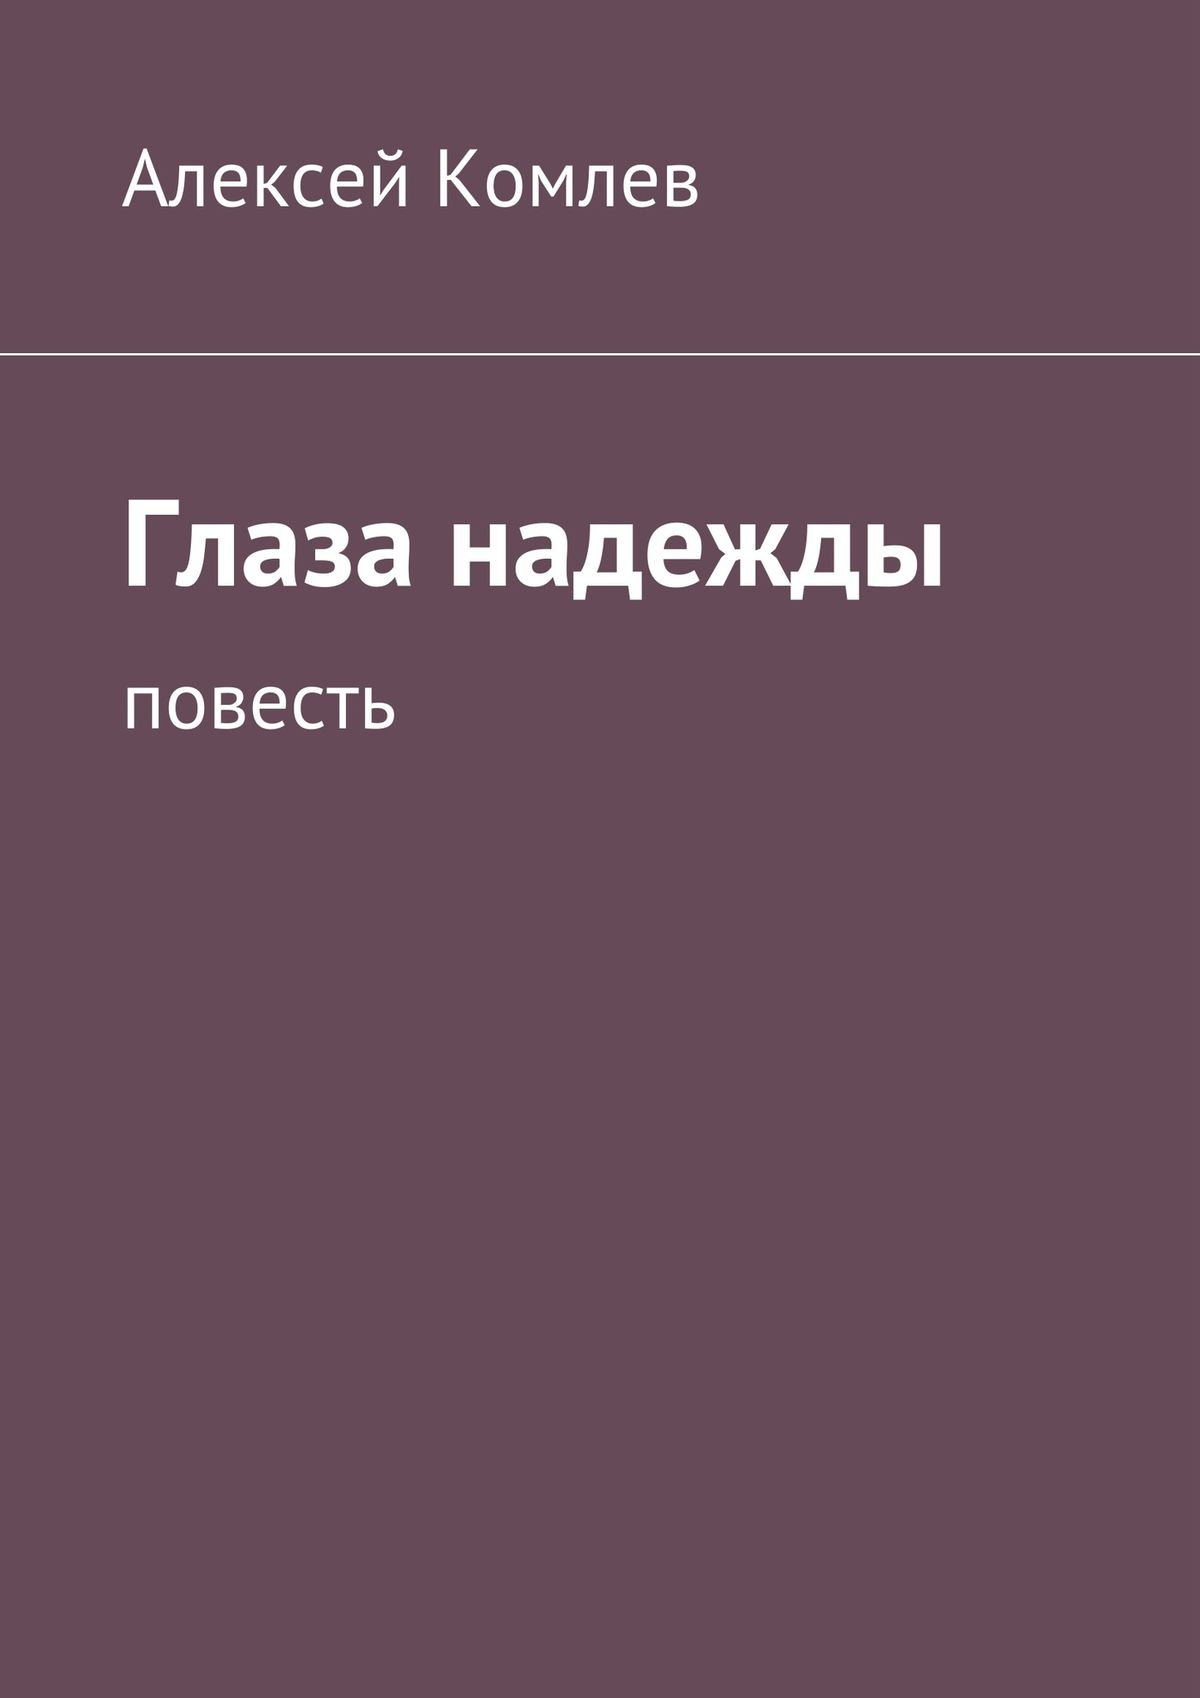 Алексей Комлев Глаза надежды алексей комлев глаза надежды